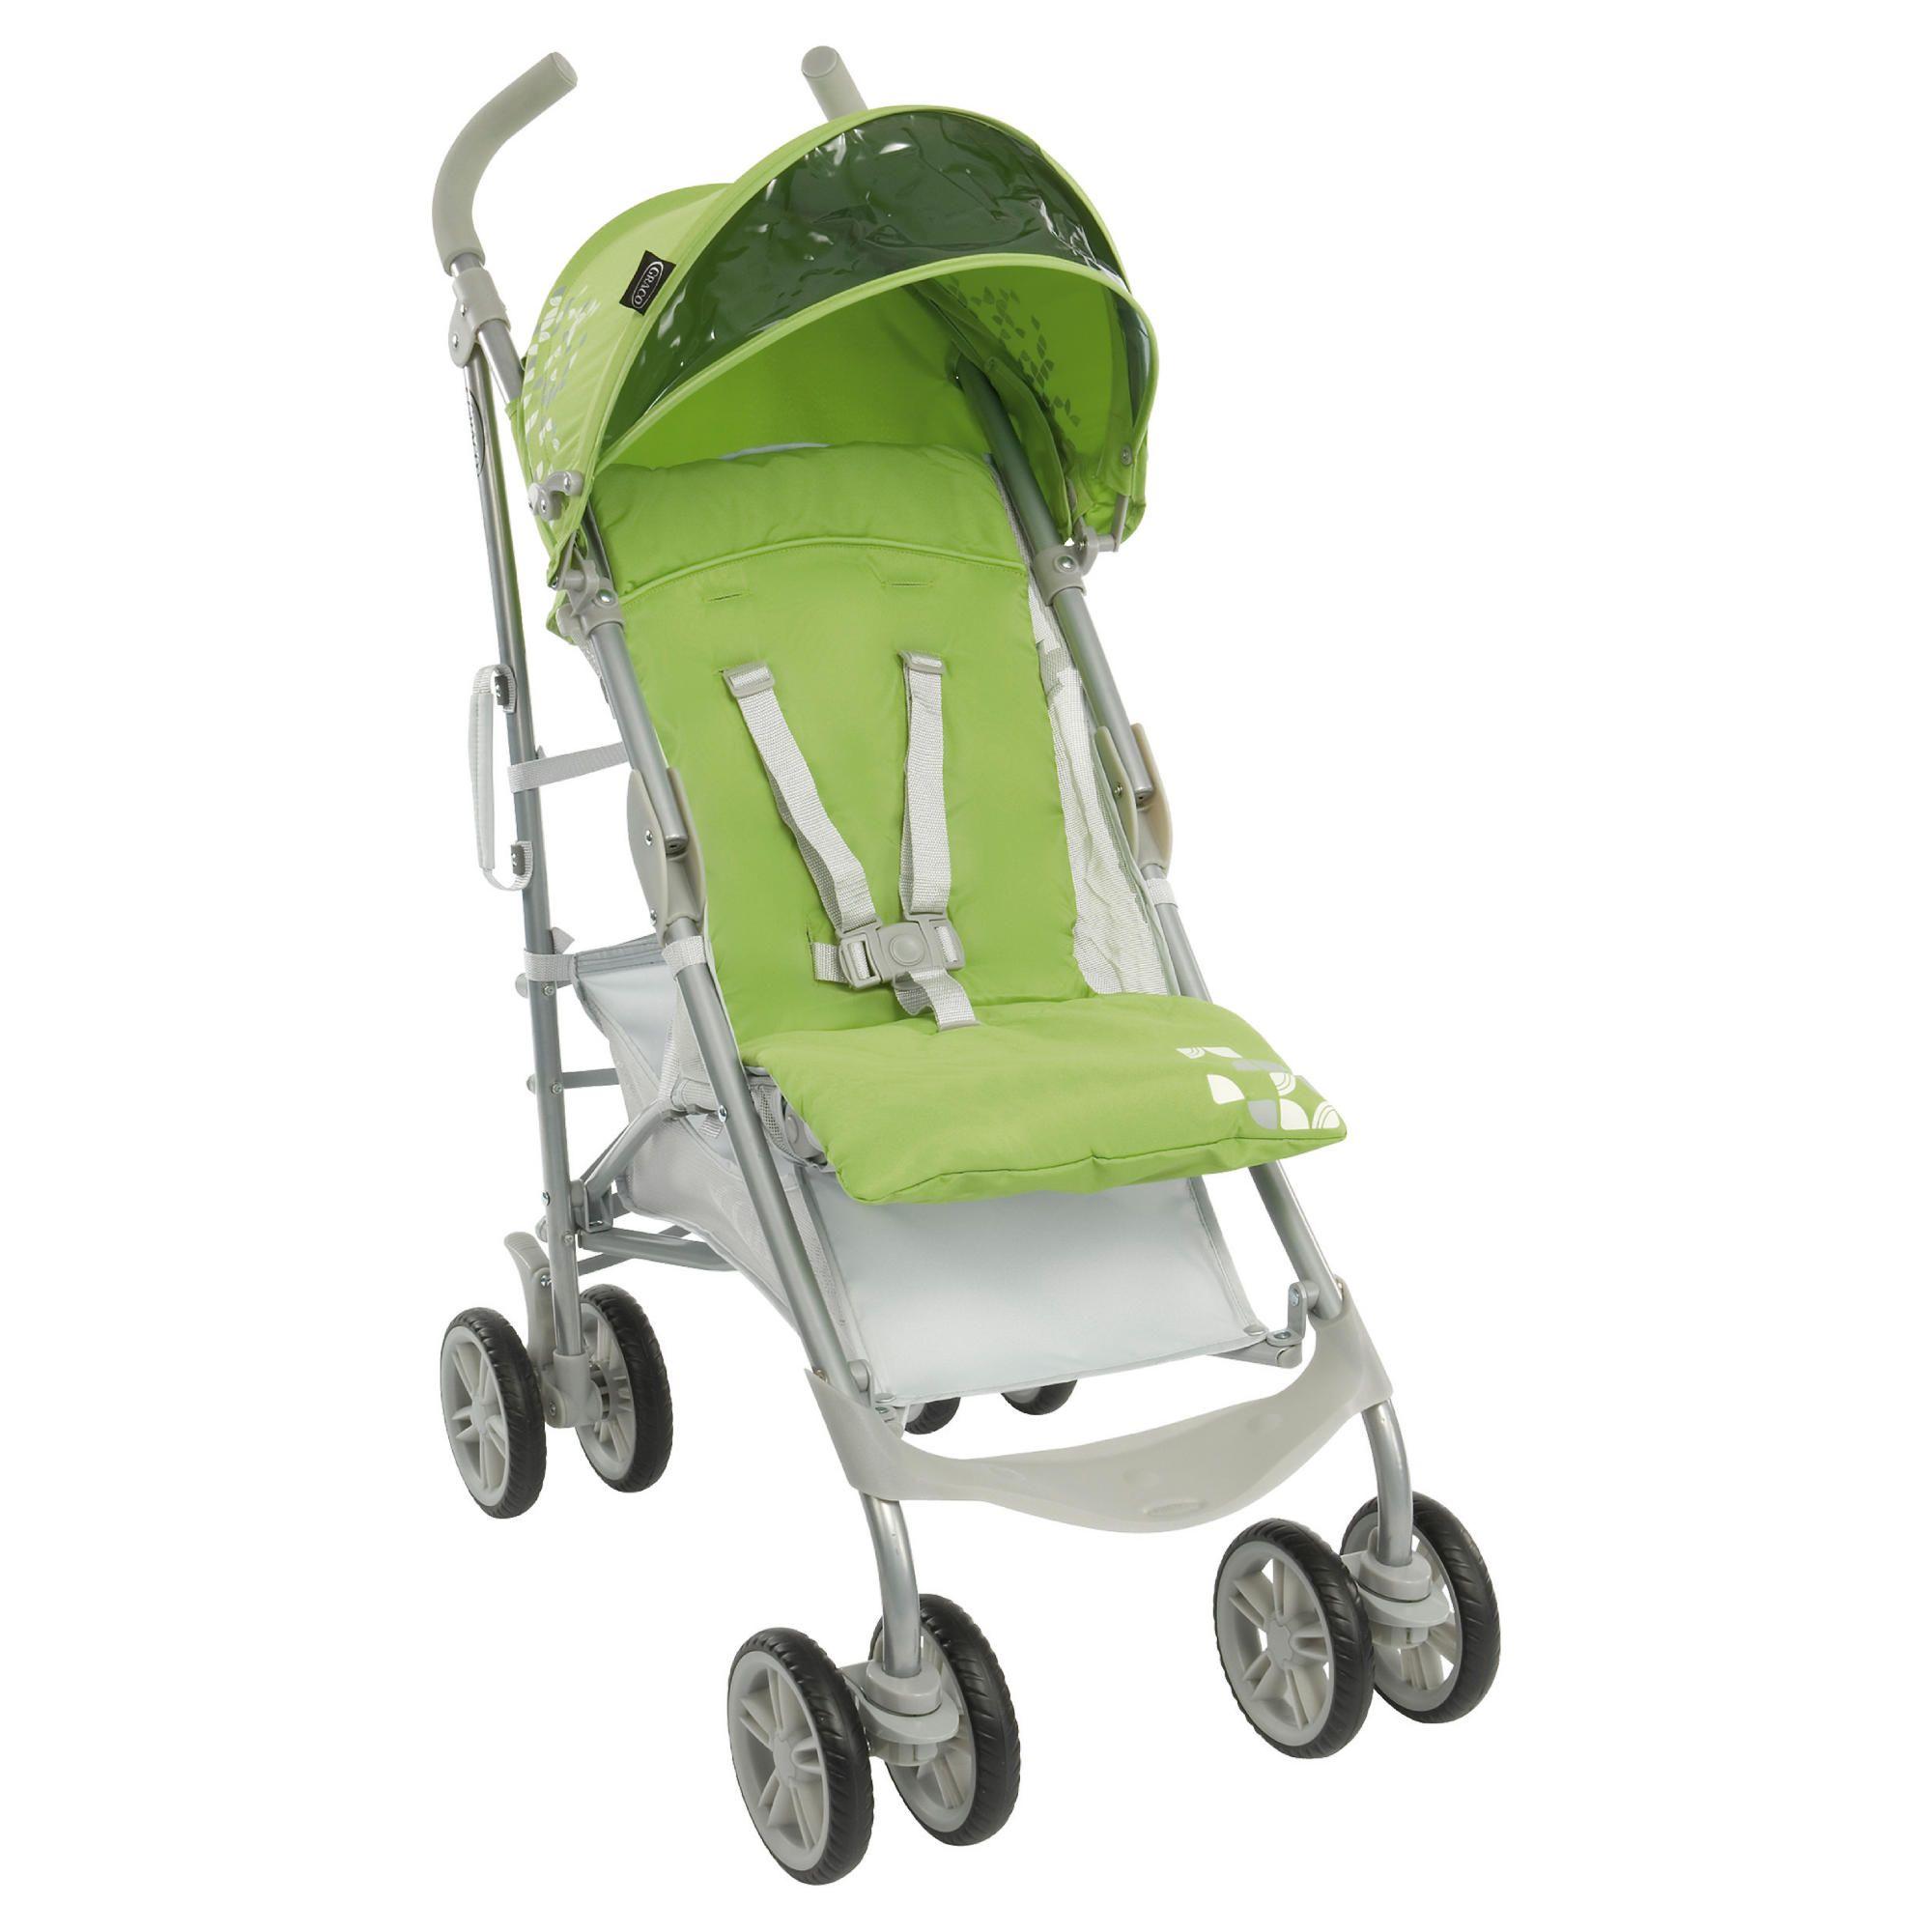 Baby Prams Carrycots Buggies Amp Strollers Prams